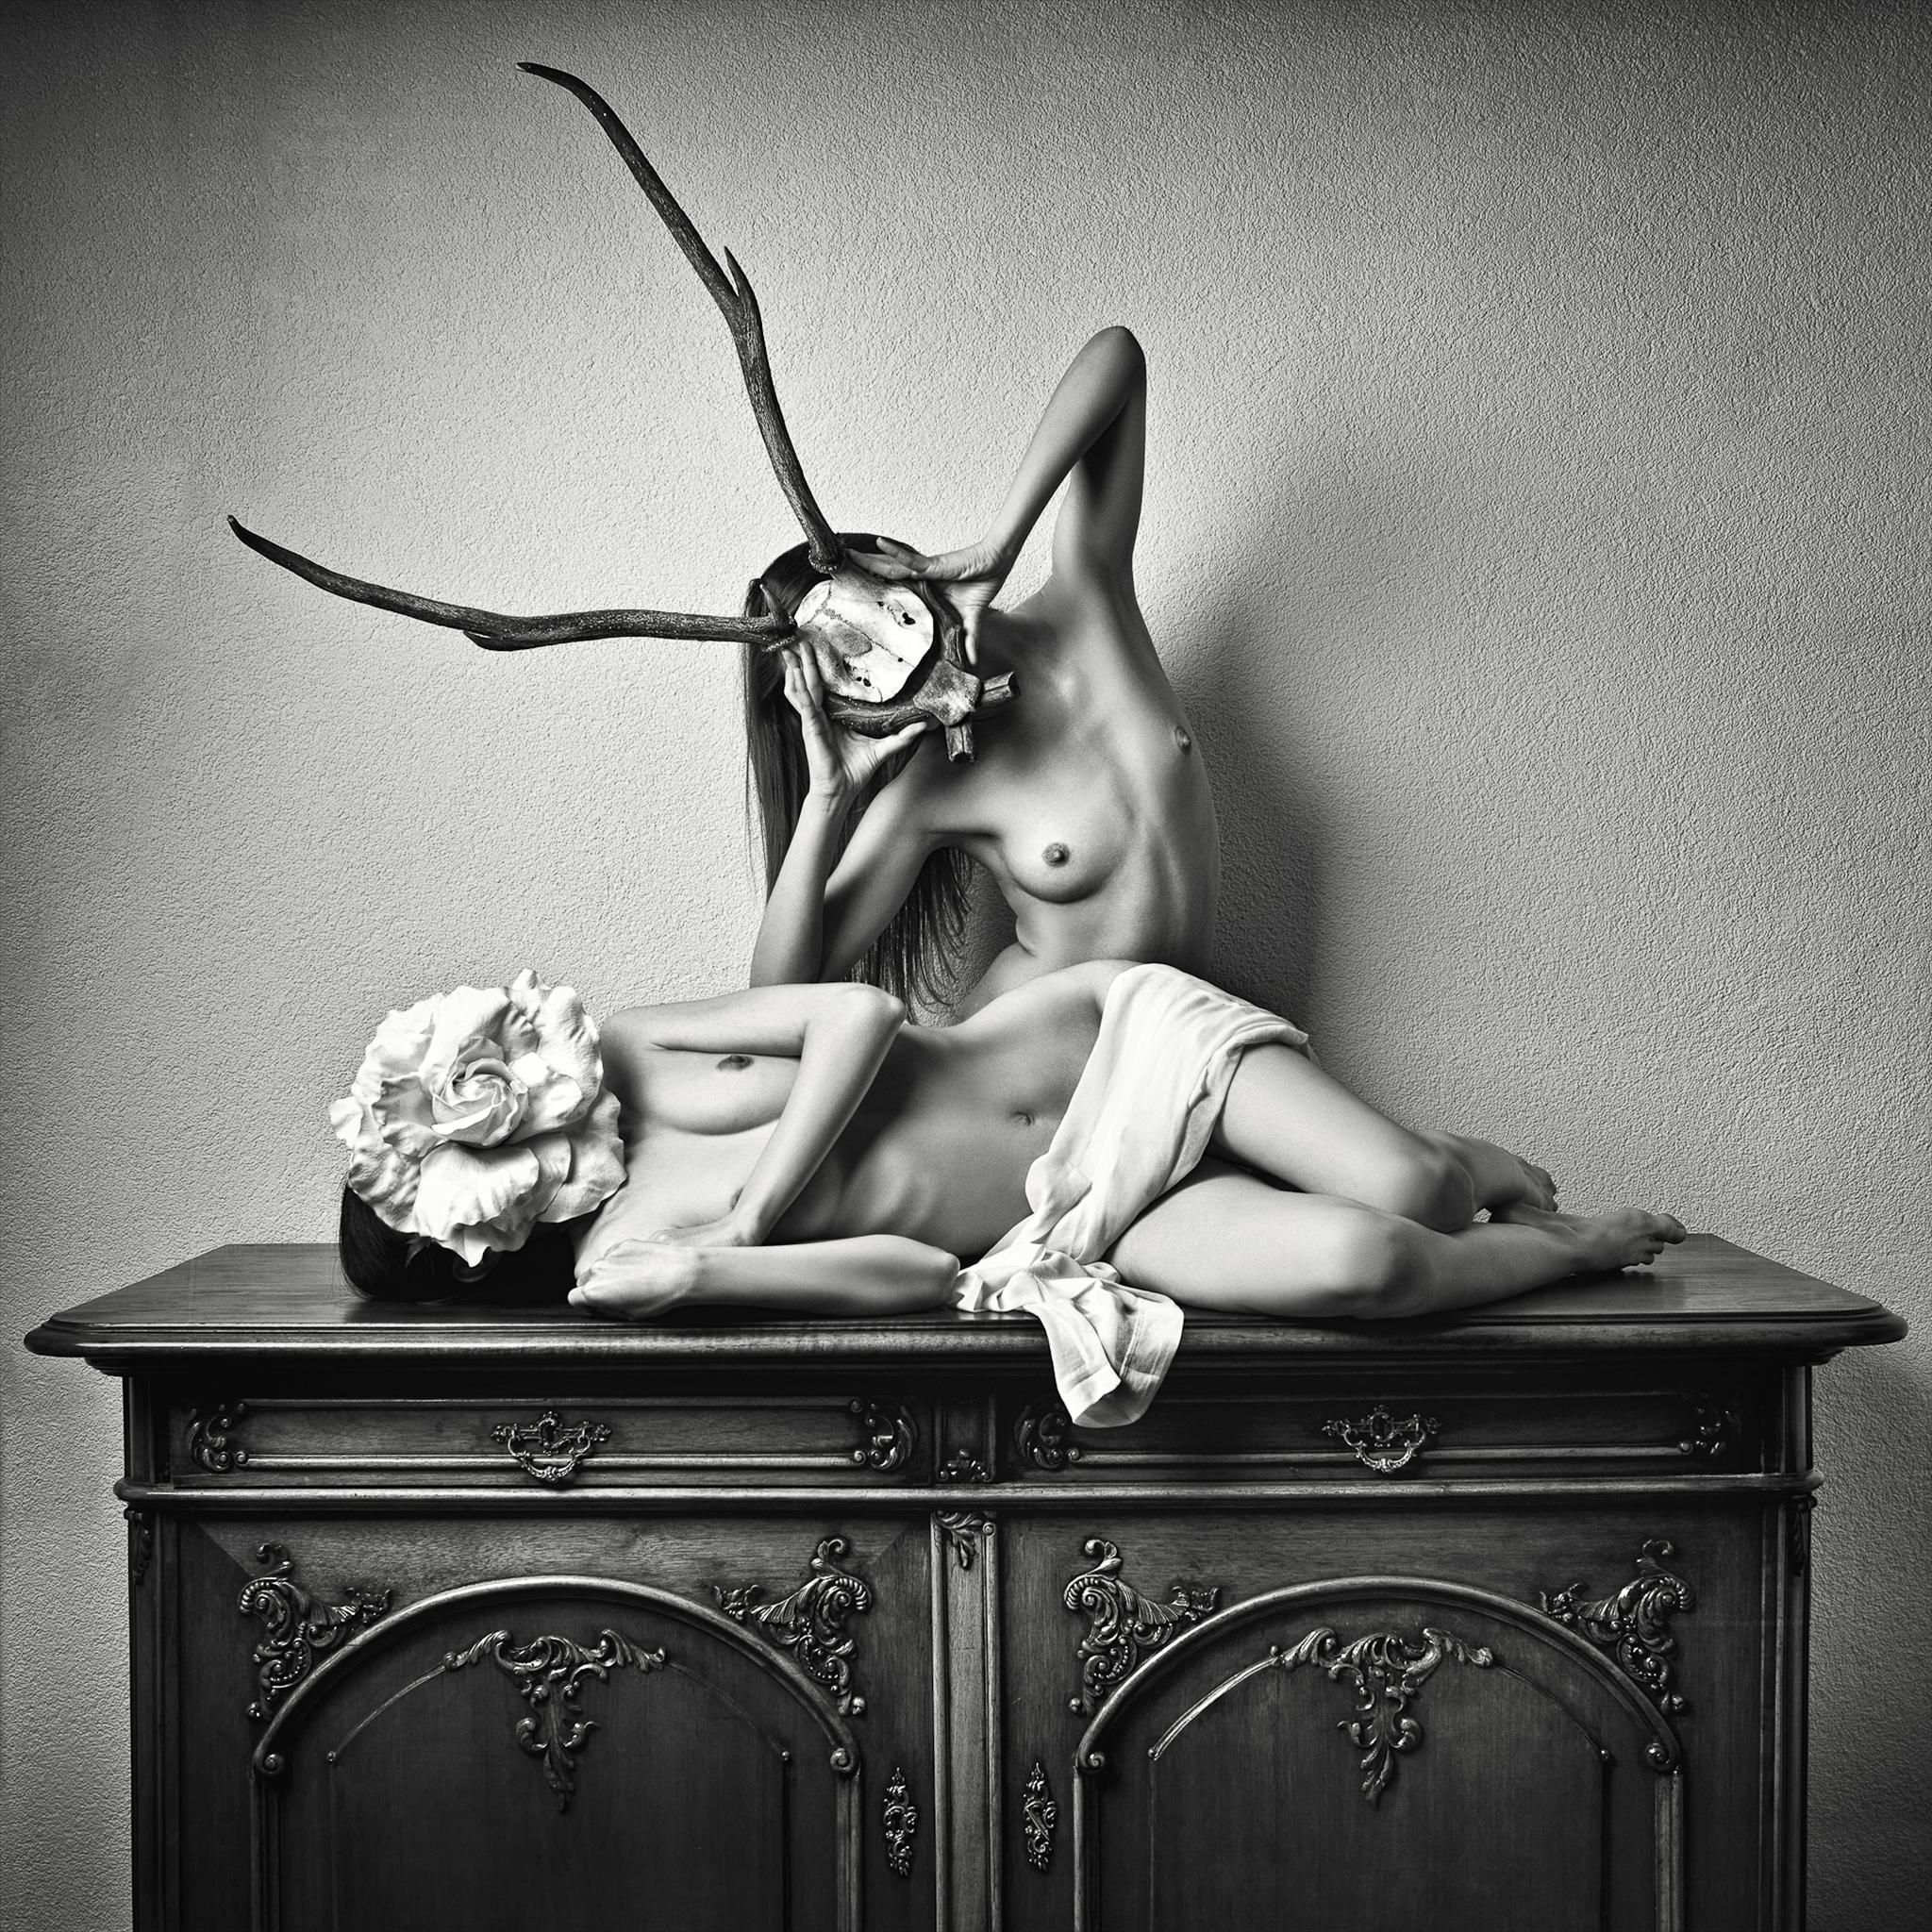 Eros & Thanathos - Daniel Ilinca @ yourPainting